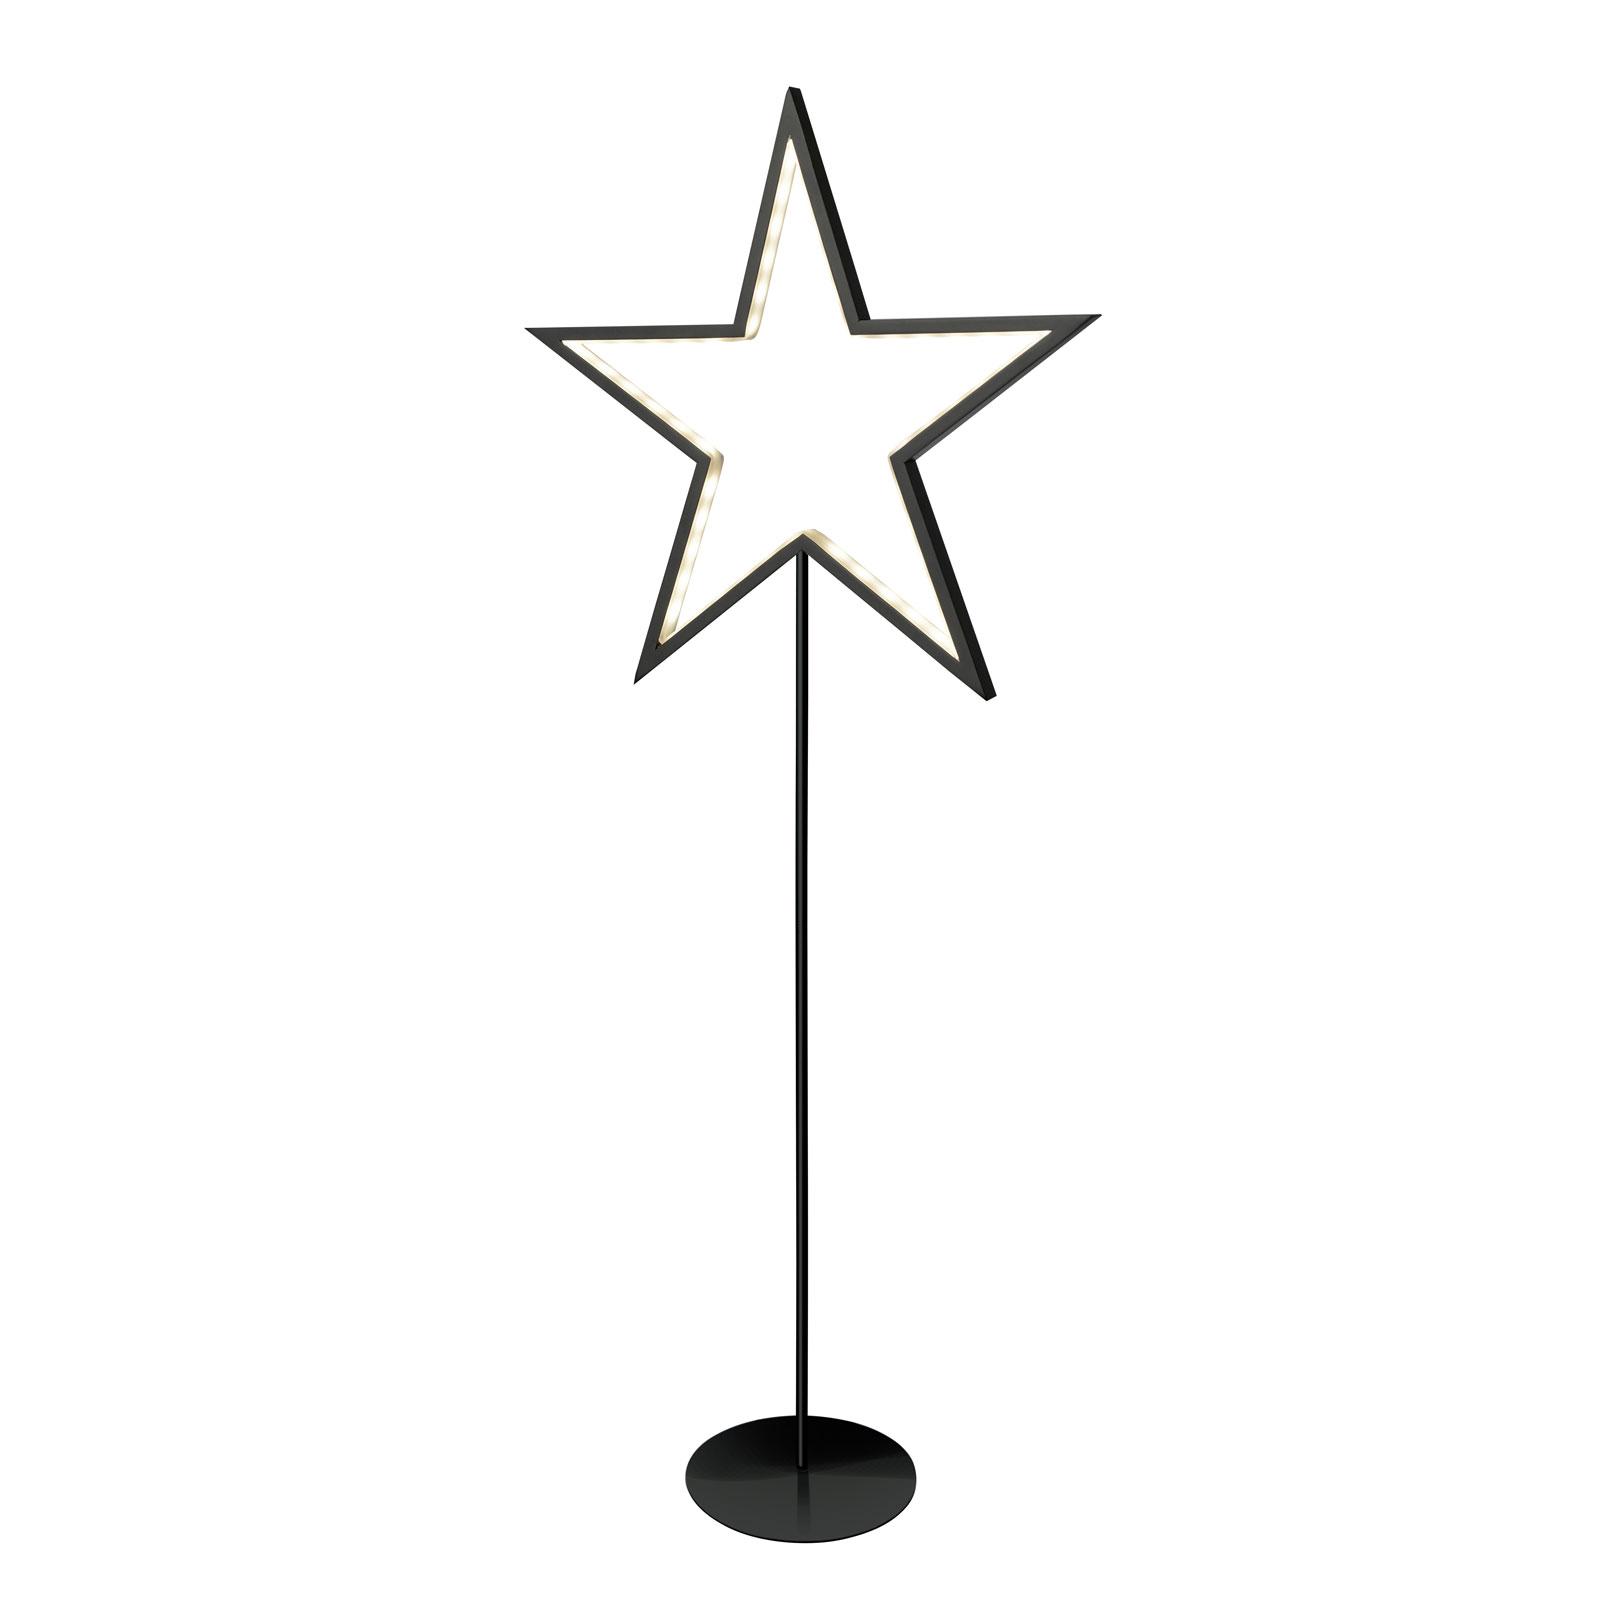 Lampada Lucy a stella cromata